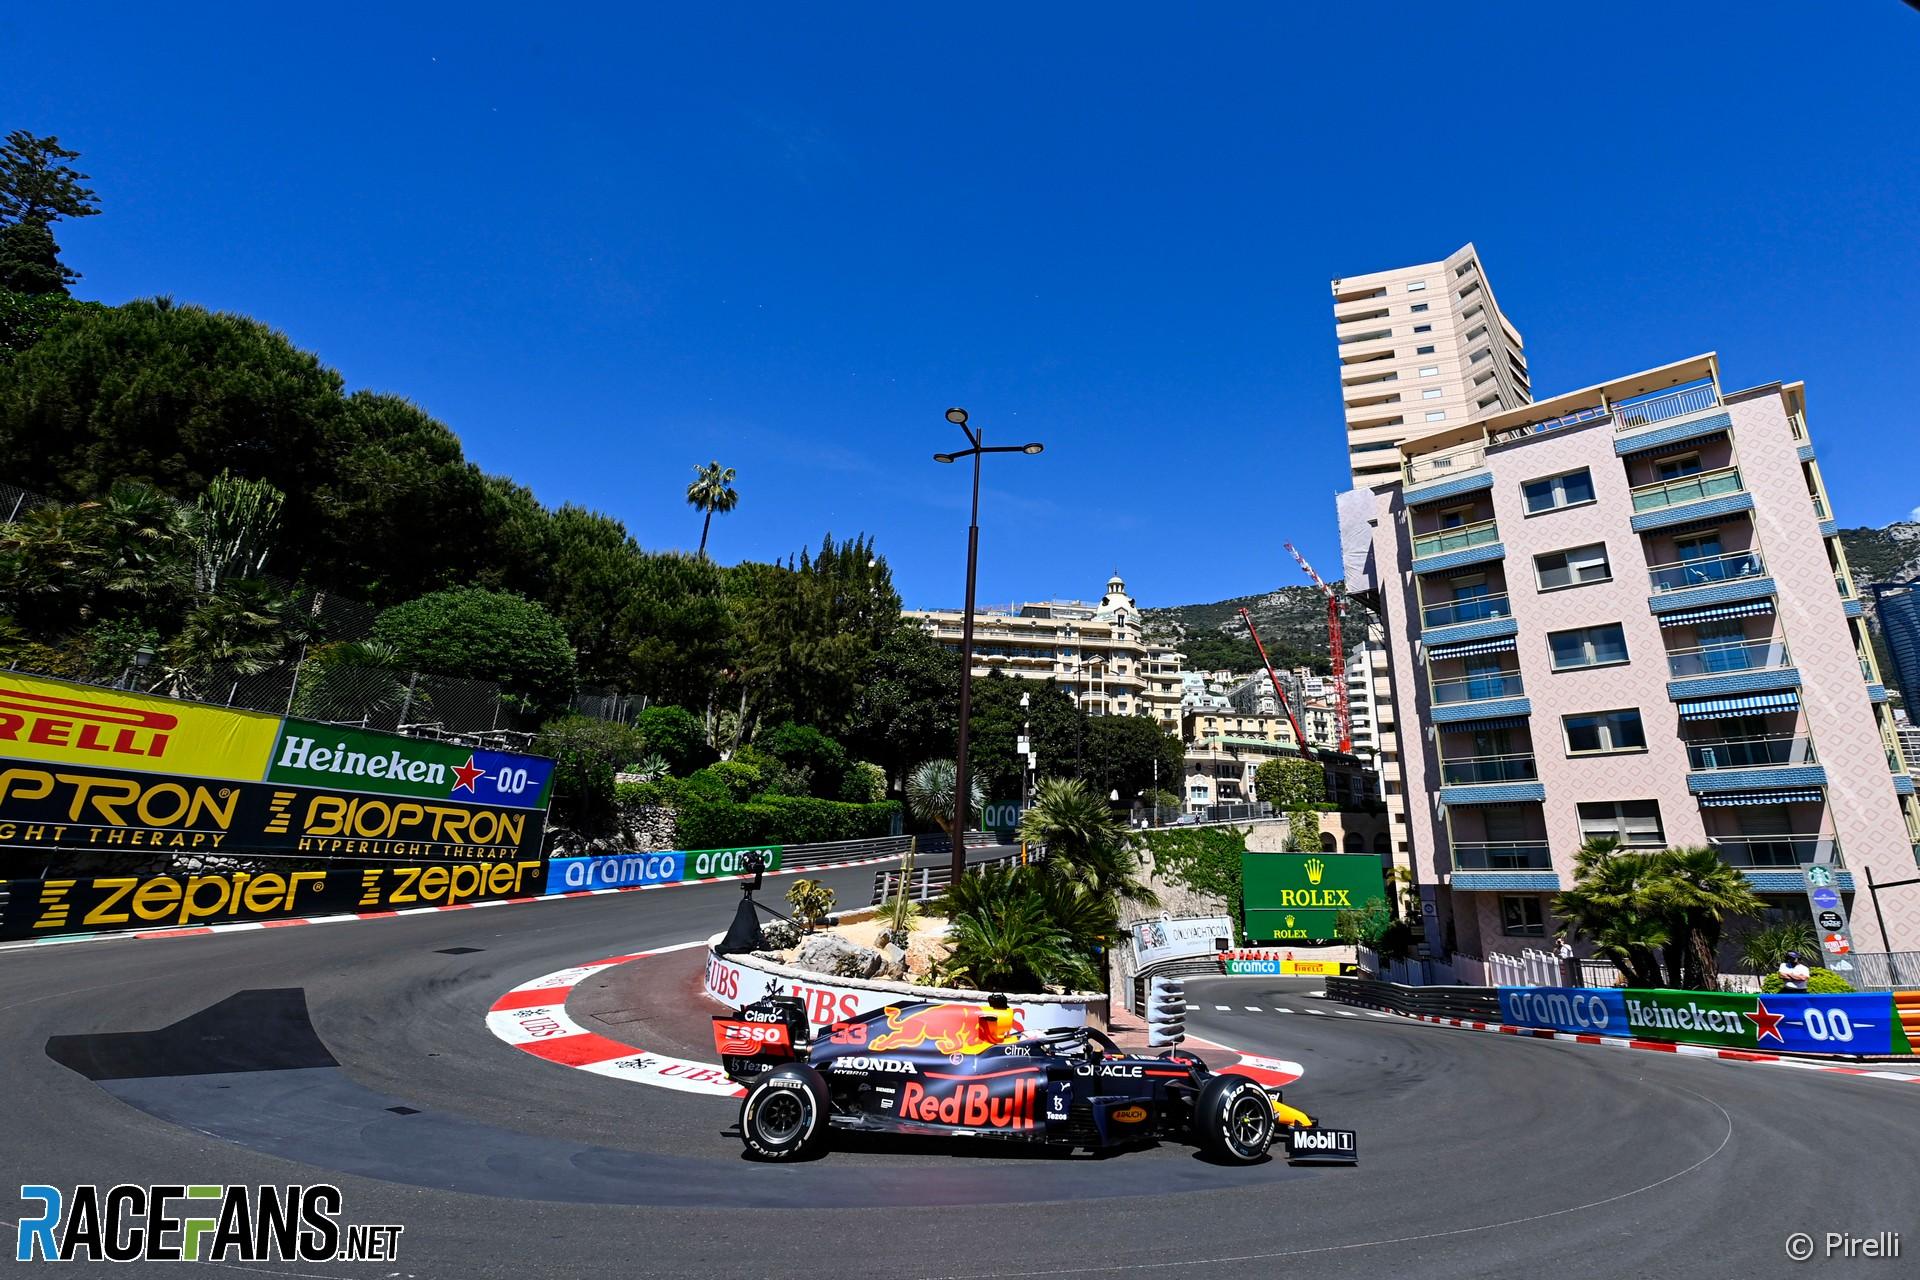 2022 F1 calendar plans revealed: 23 races and more 'triples' · RaceFans